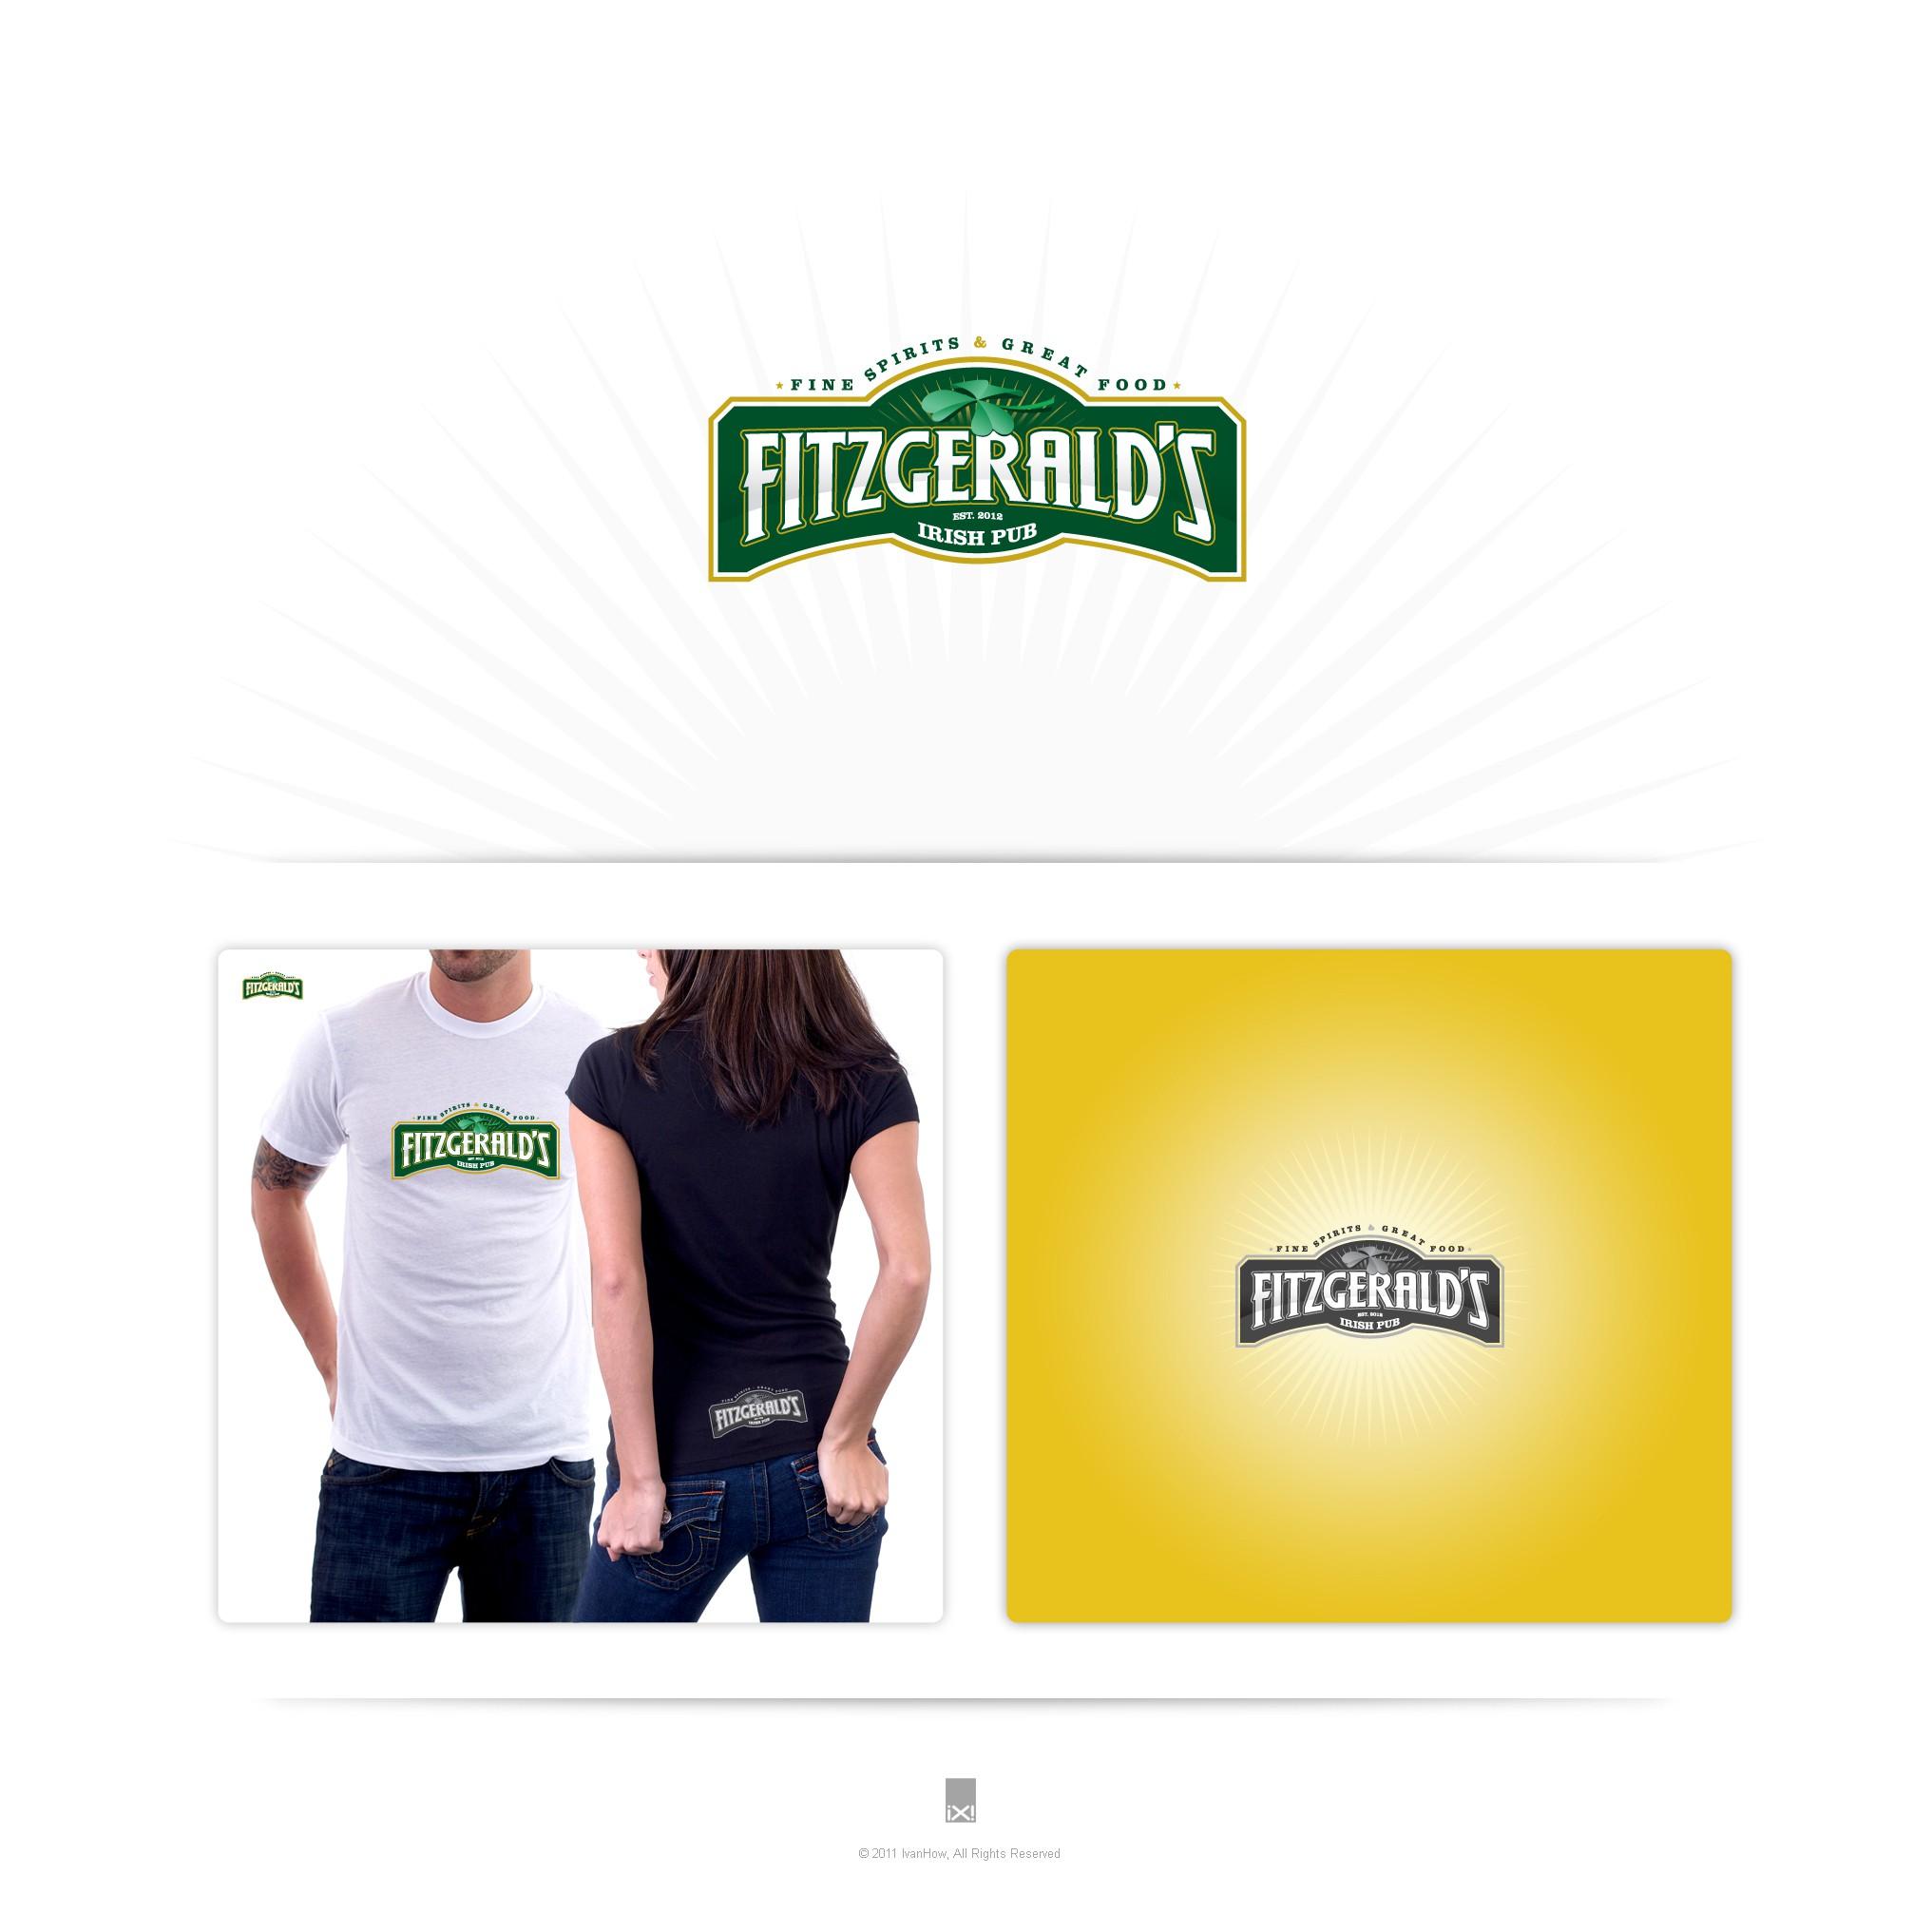 Fitzgerald's needs a new logo